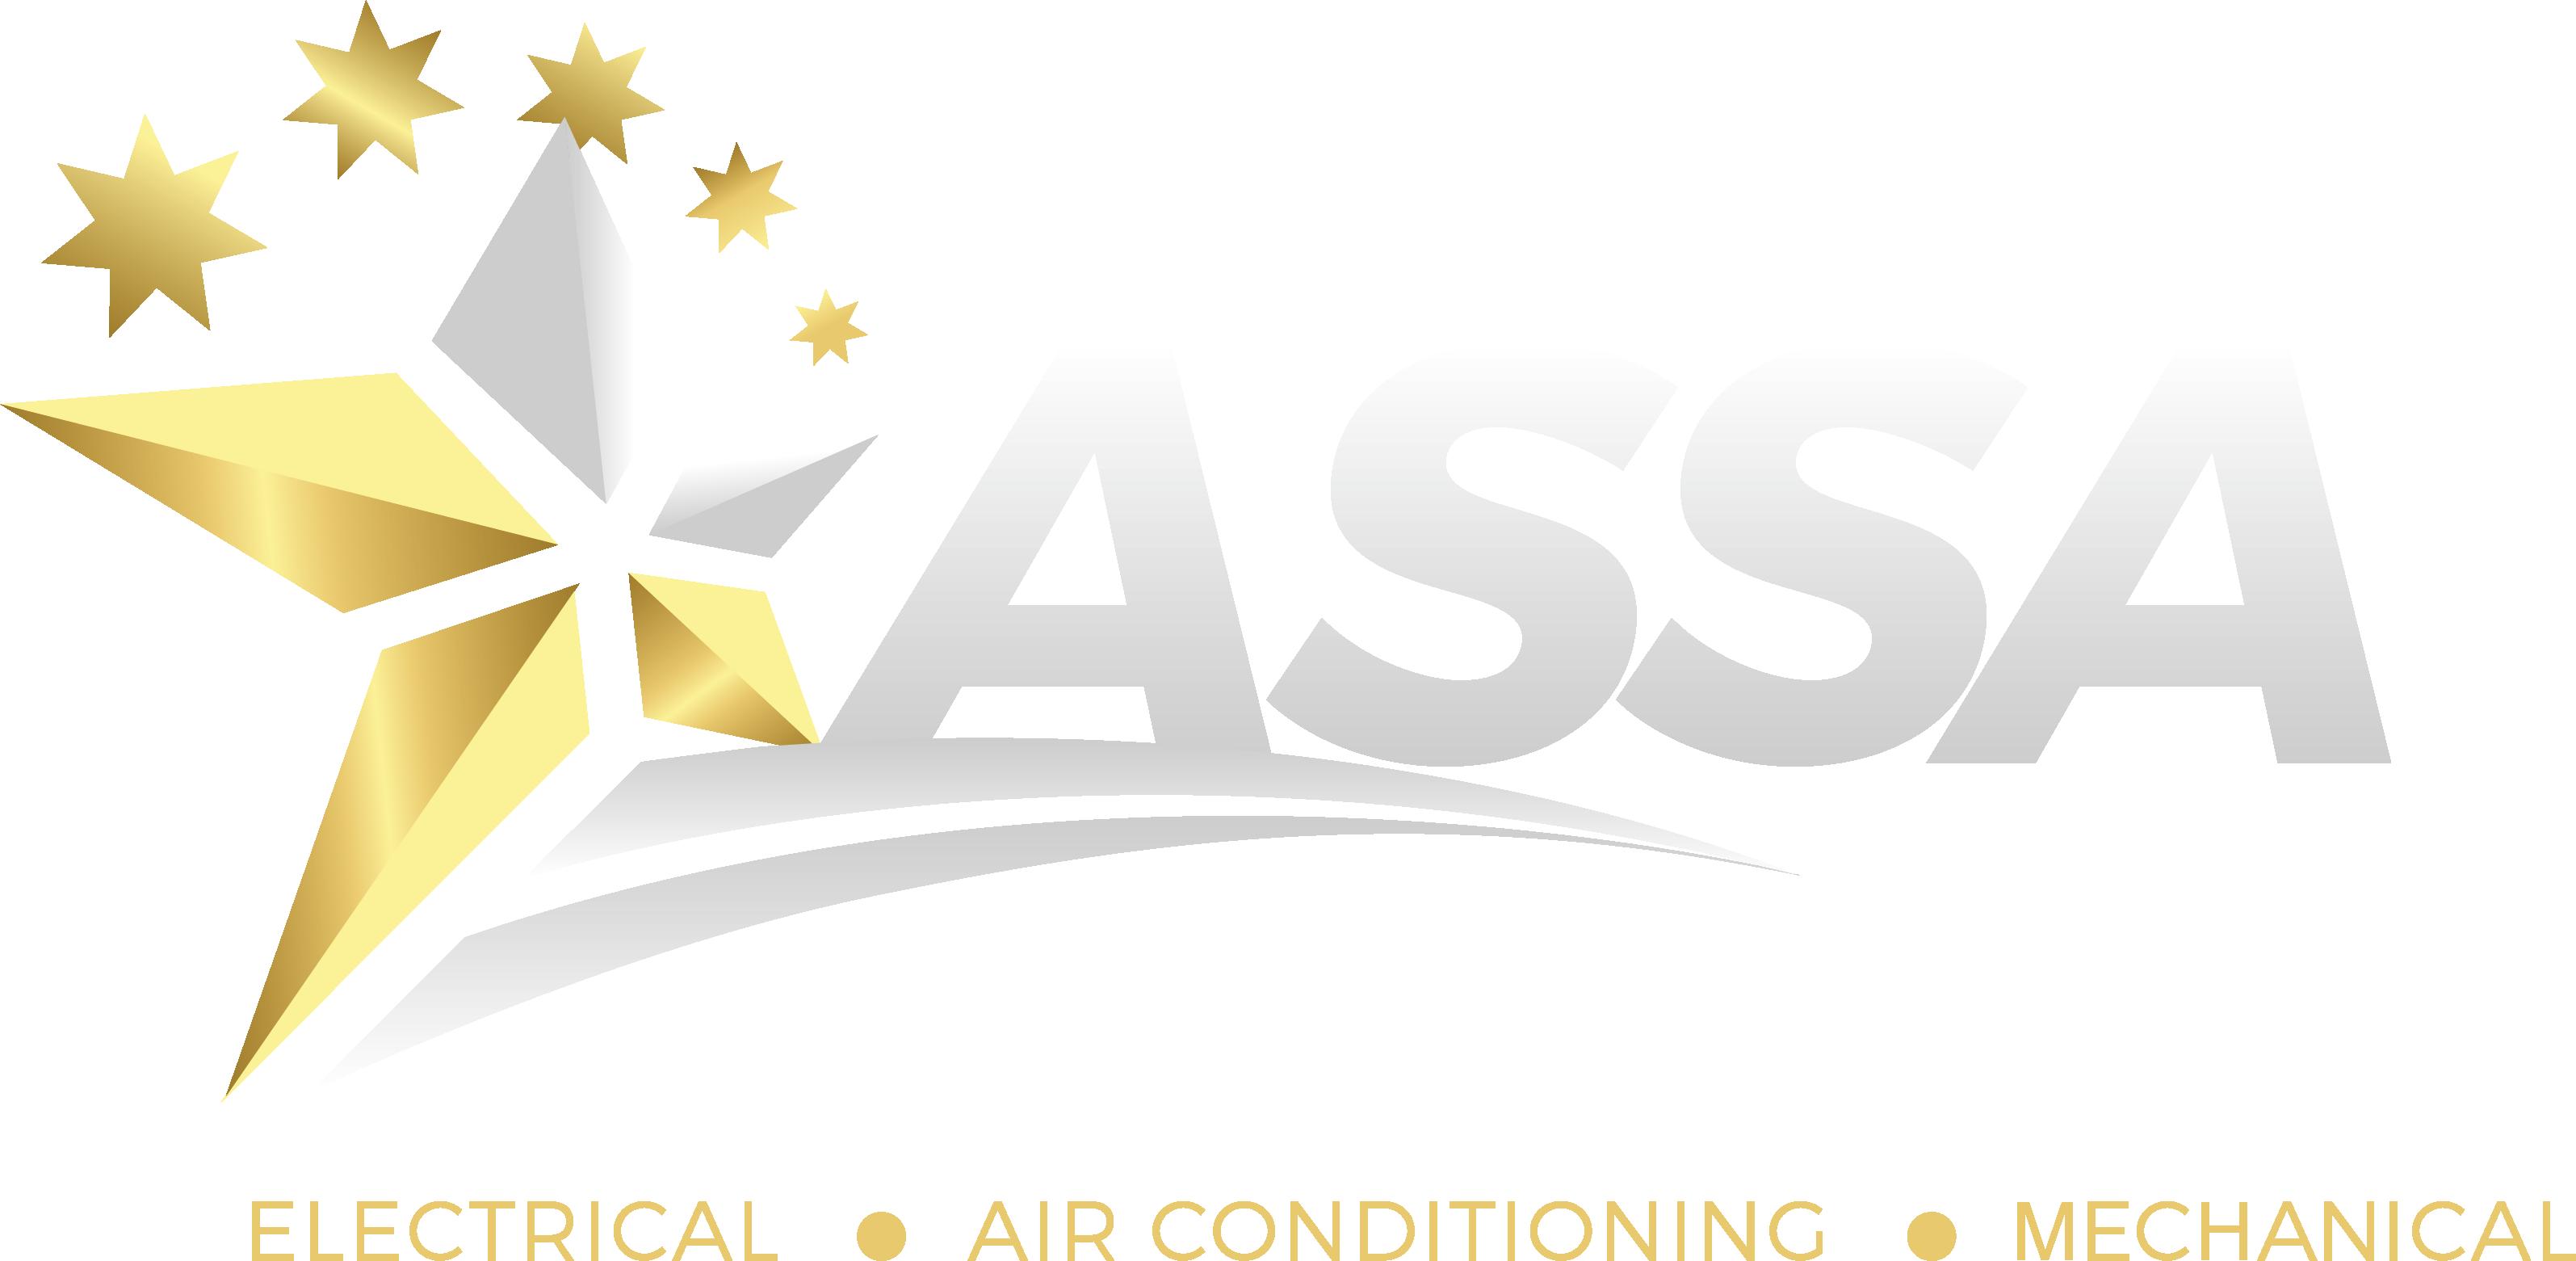 All Star Services Australia